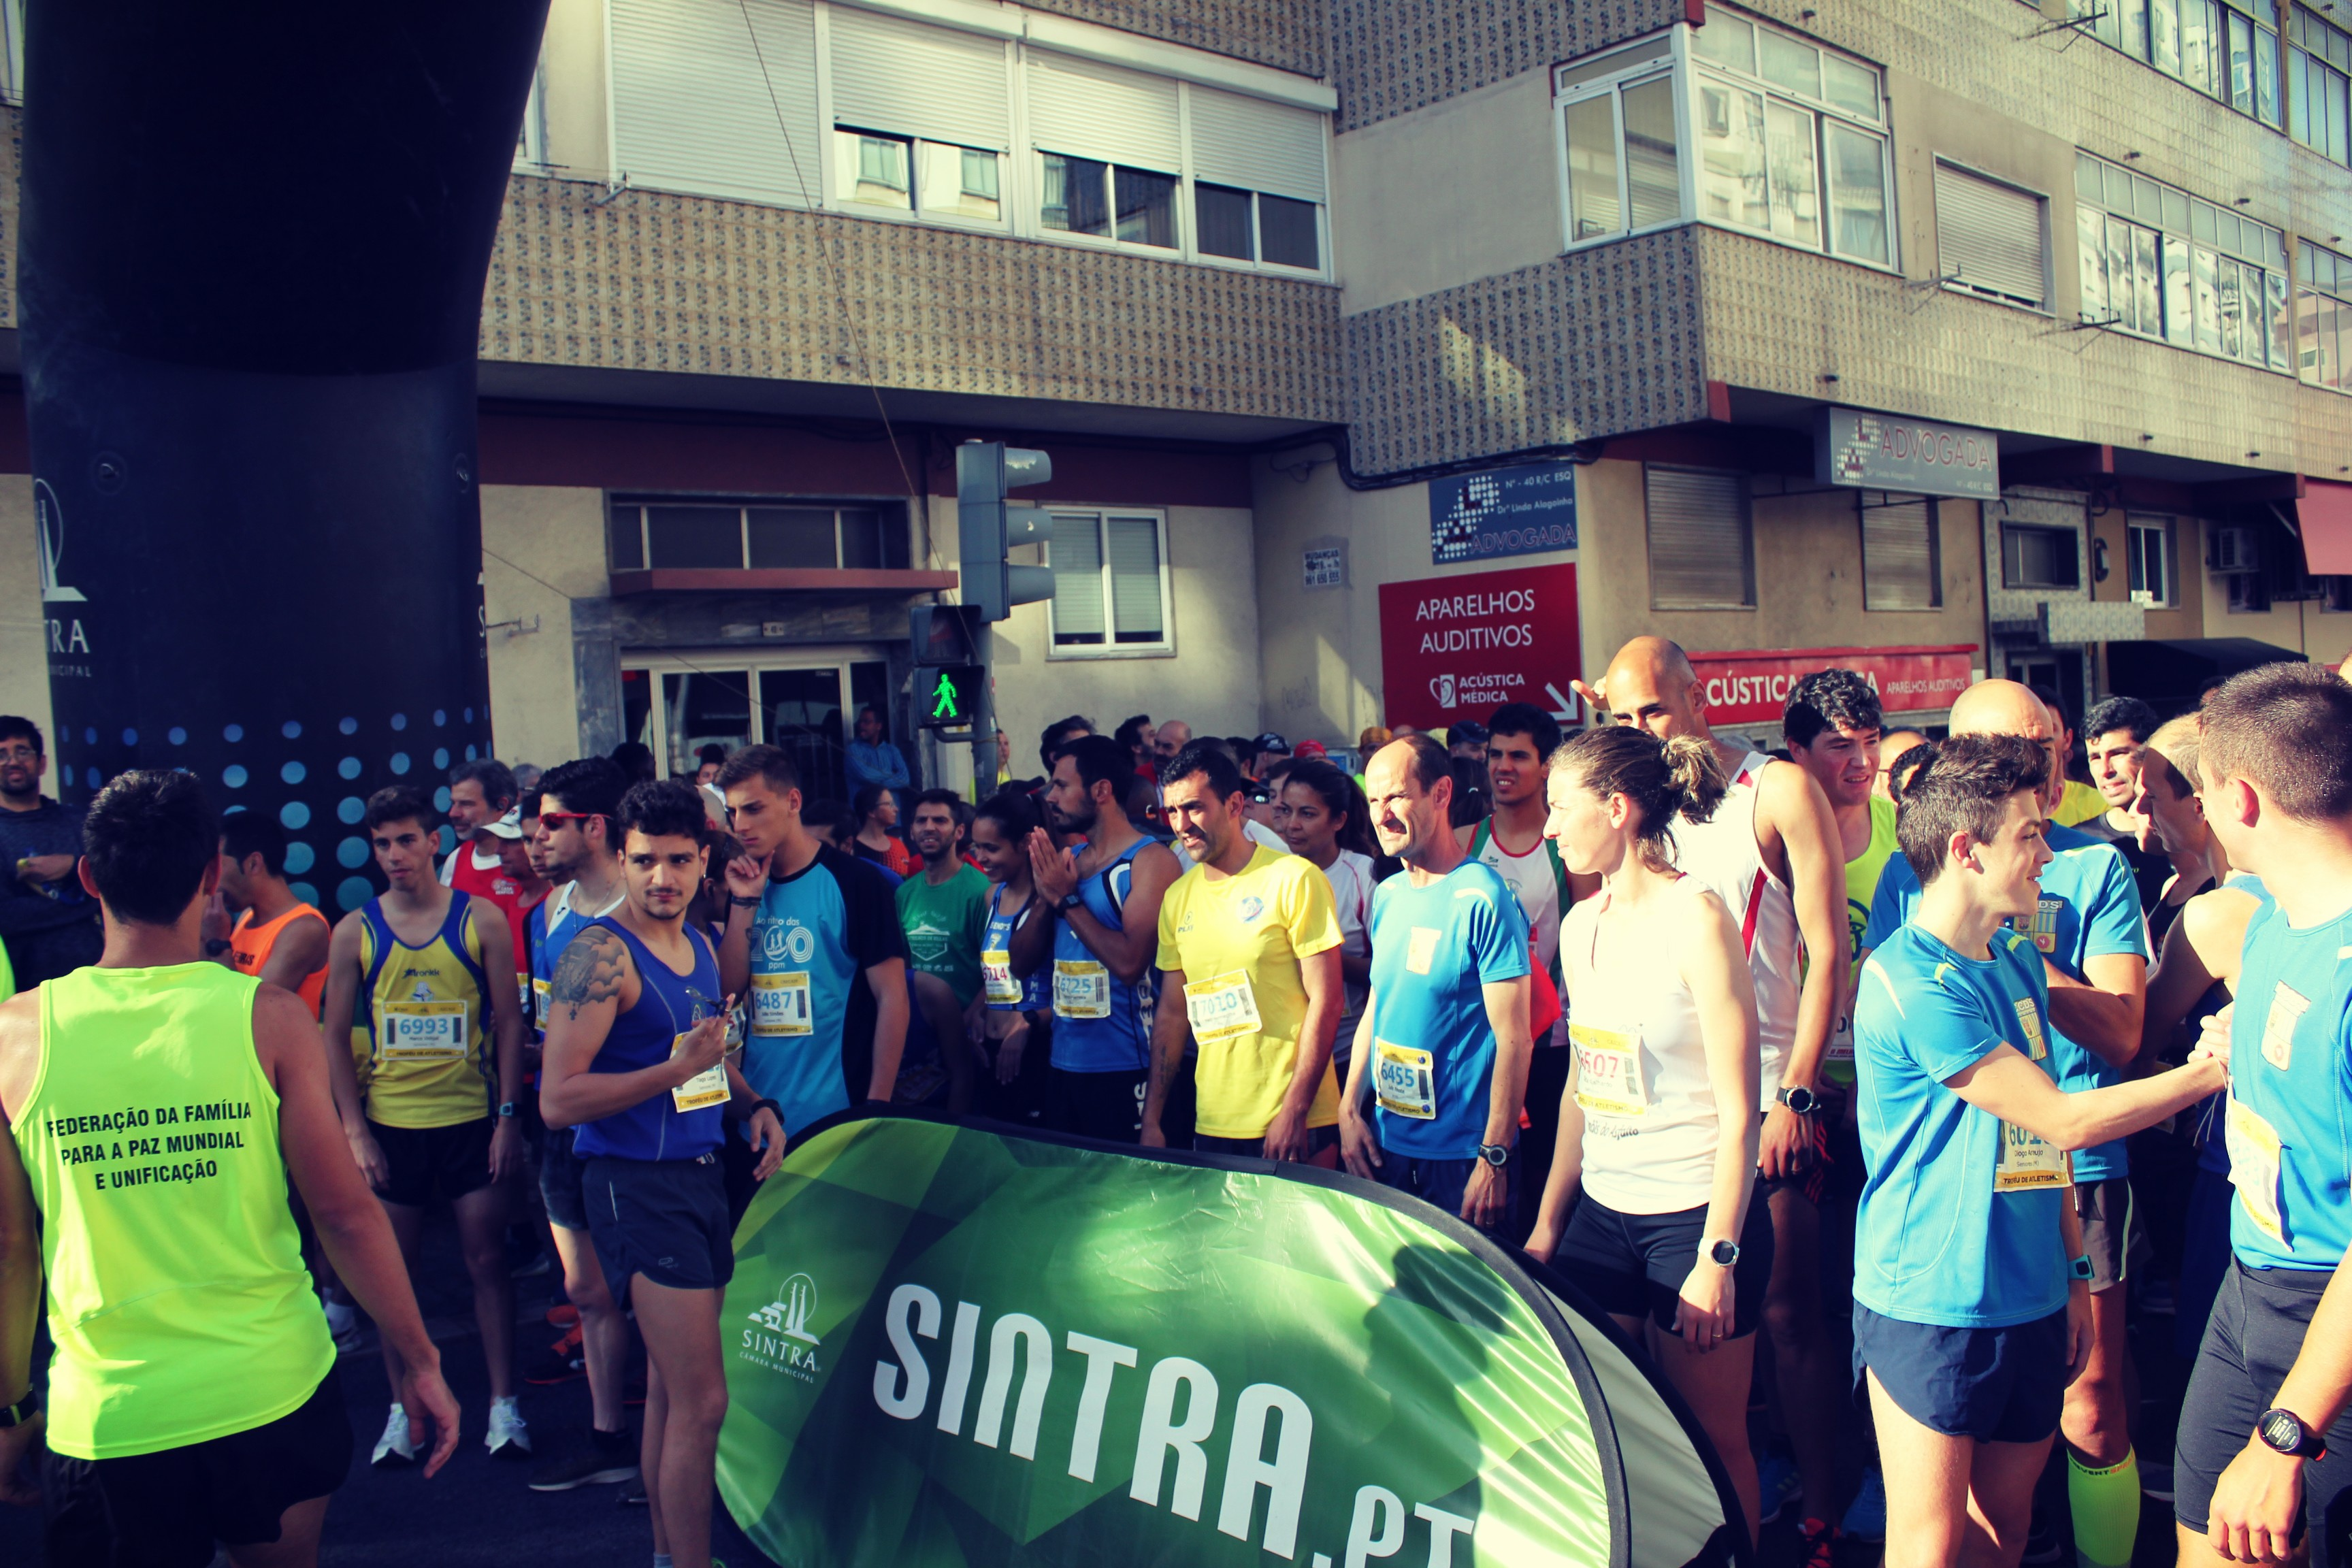 Aconteceu | Sintra a Correr - 2º Grande Prémio de Agualva e Mira Sintra